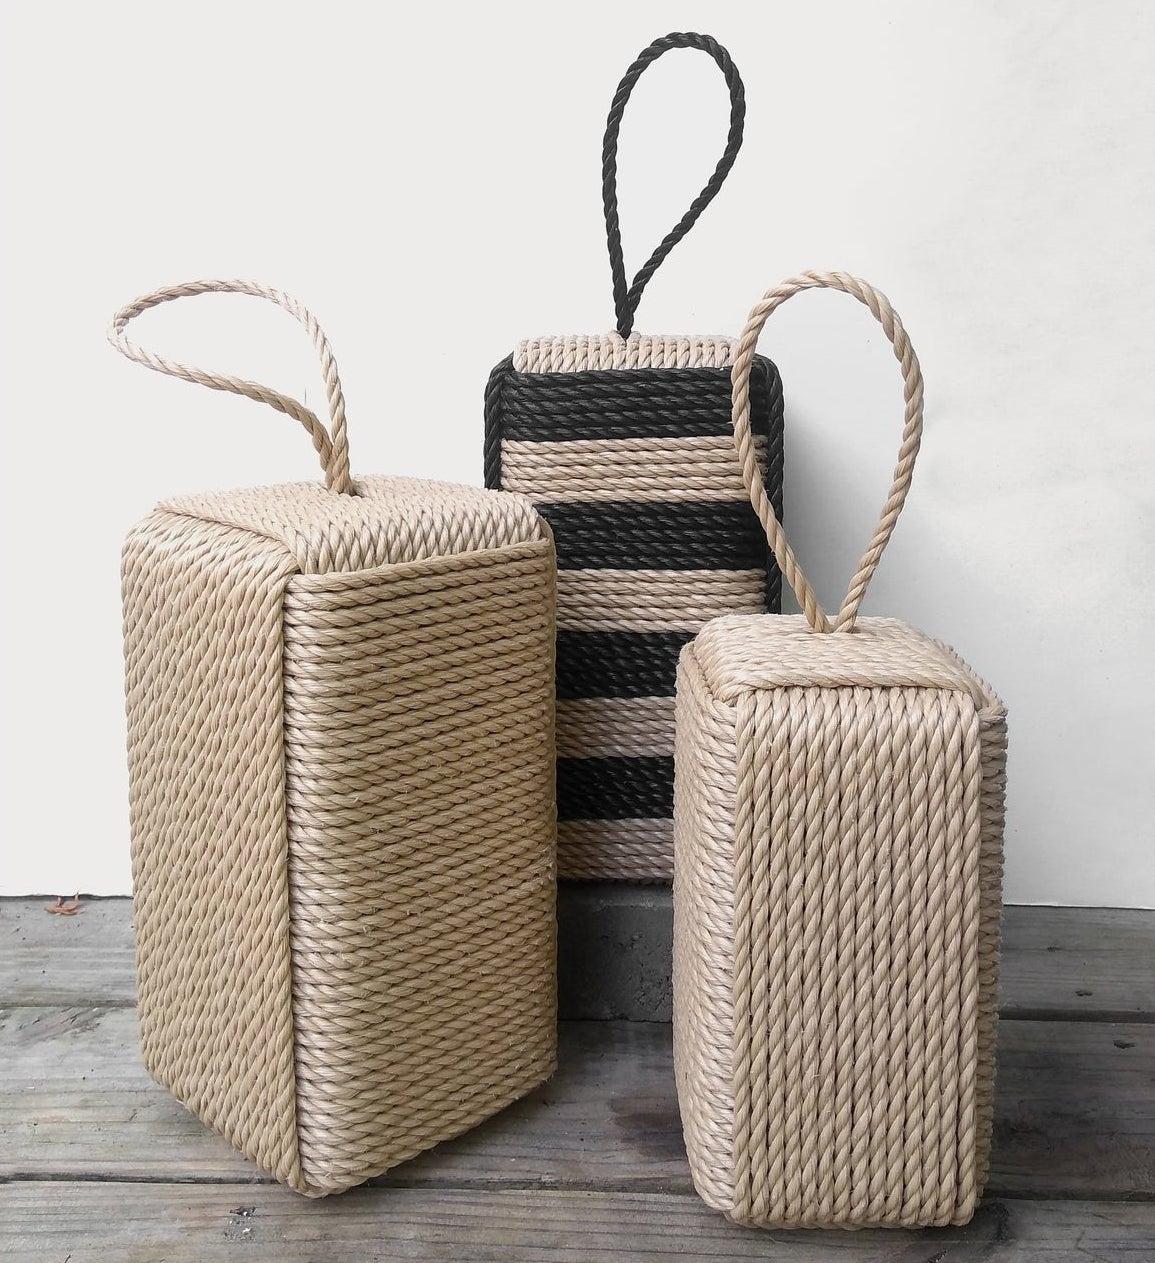 three rectangular doorstops with rope wrapped around them